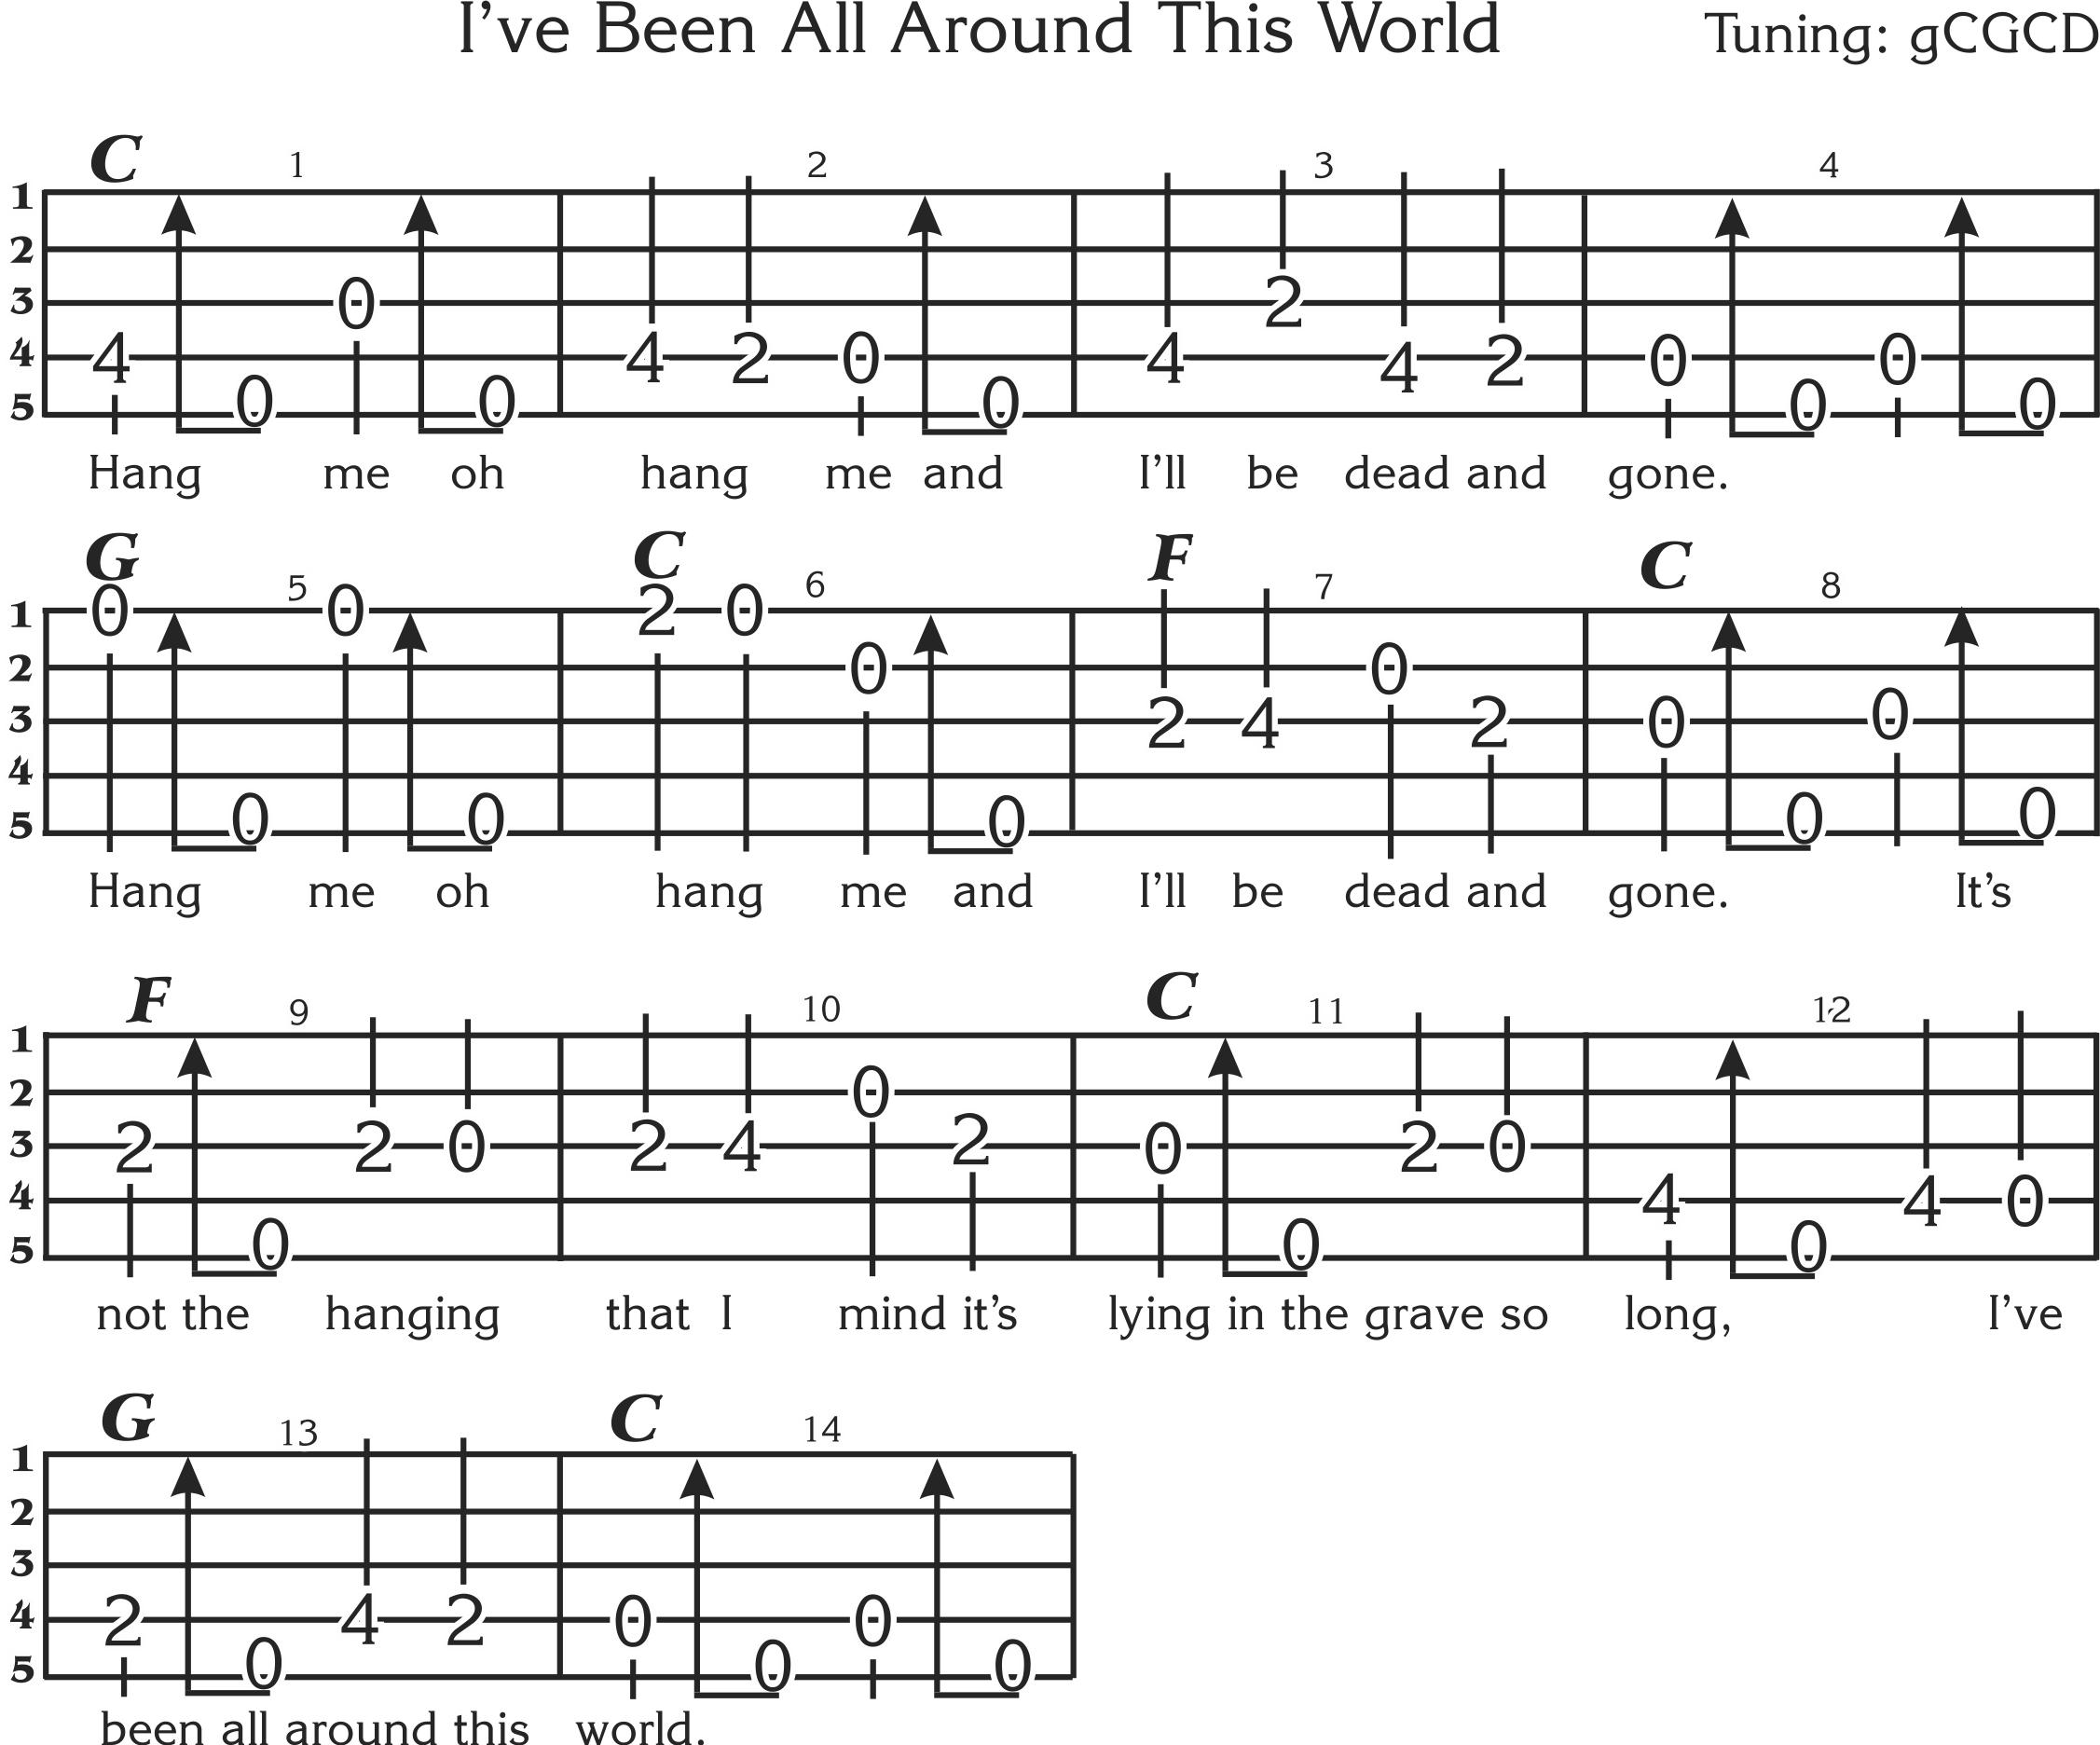 Ive Been All Around This World History Lyrics Banjo Tab